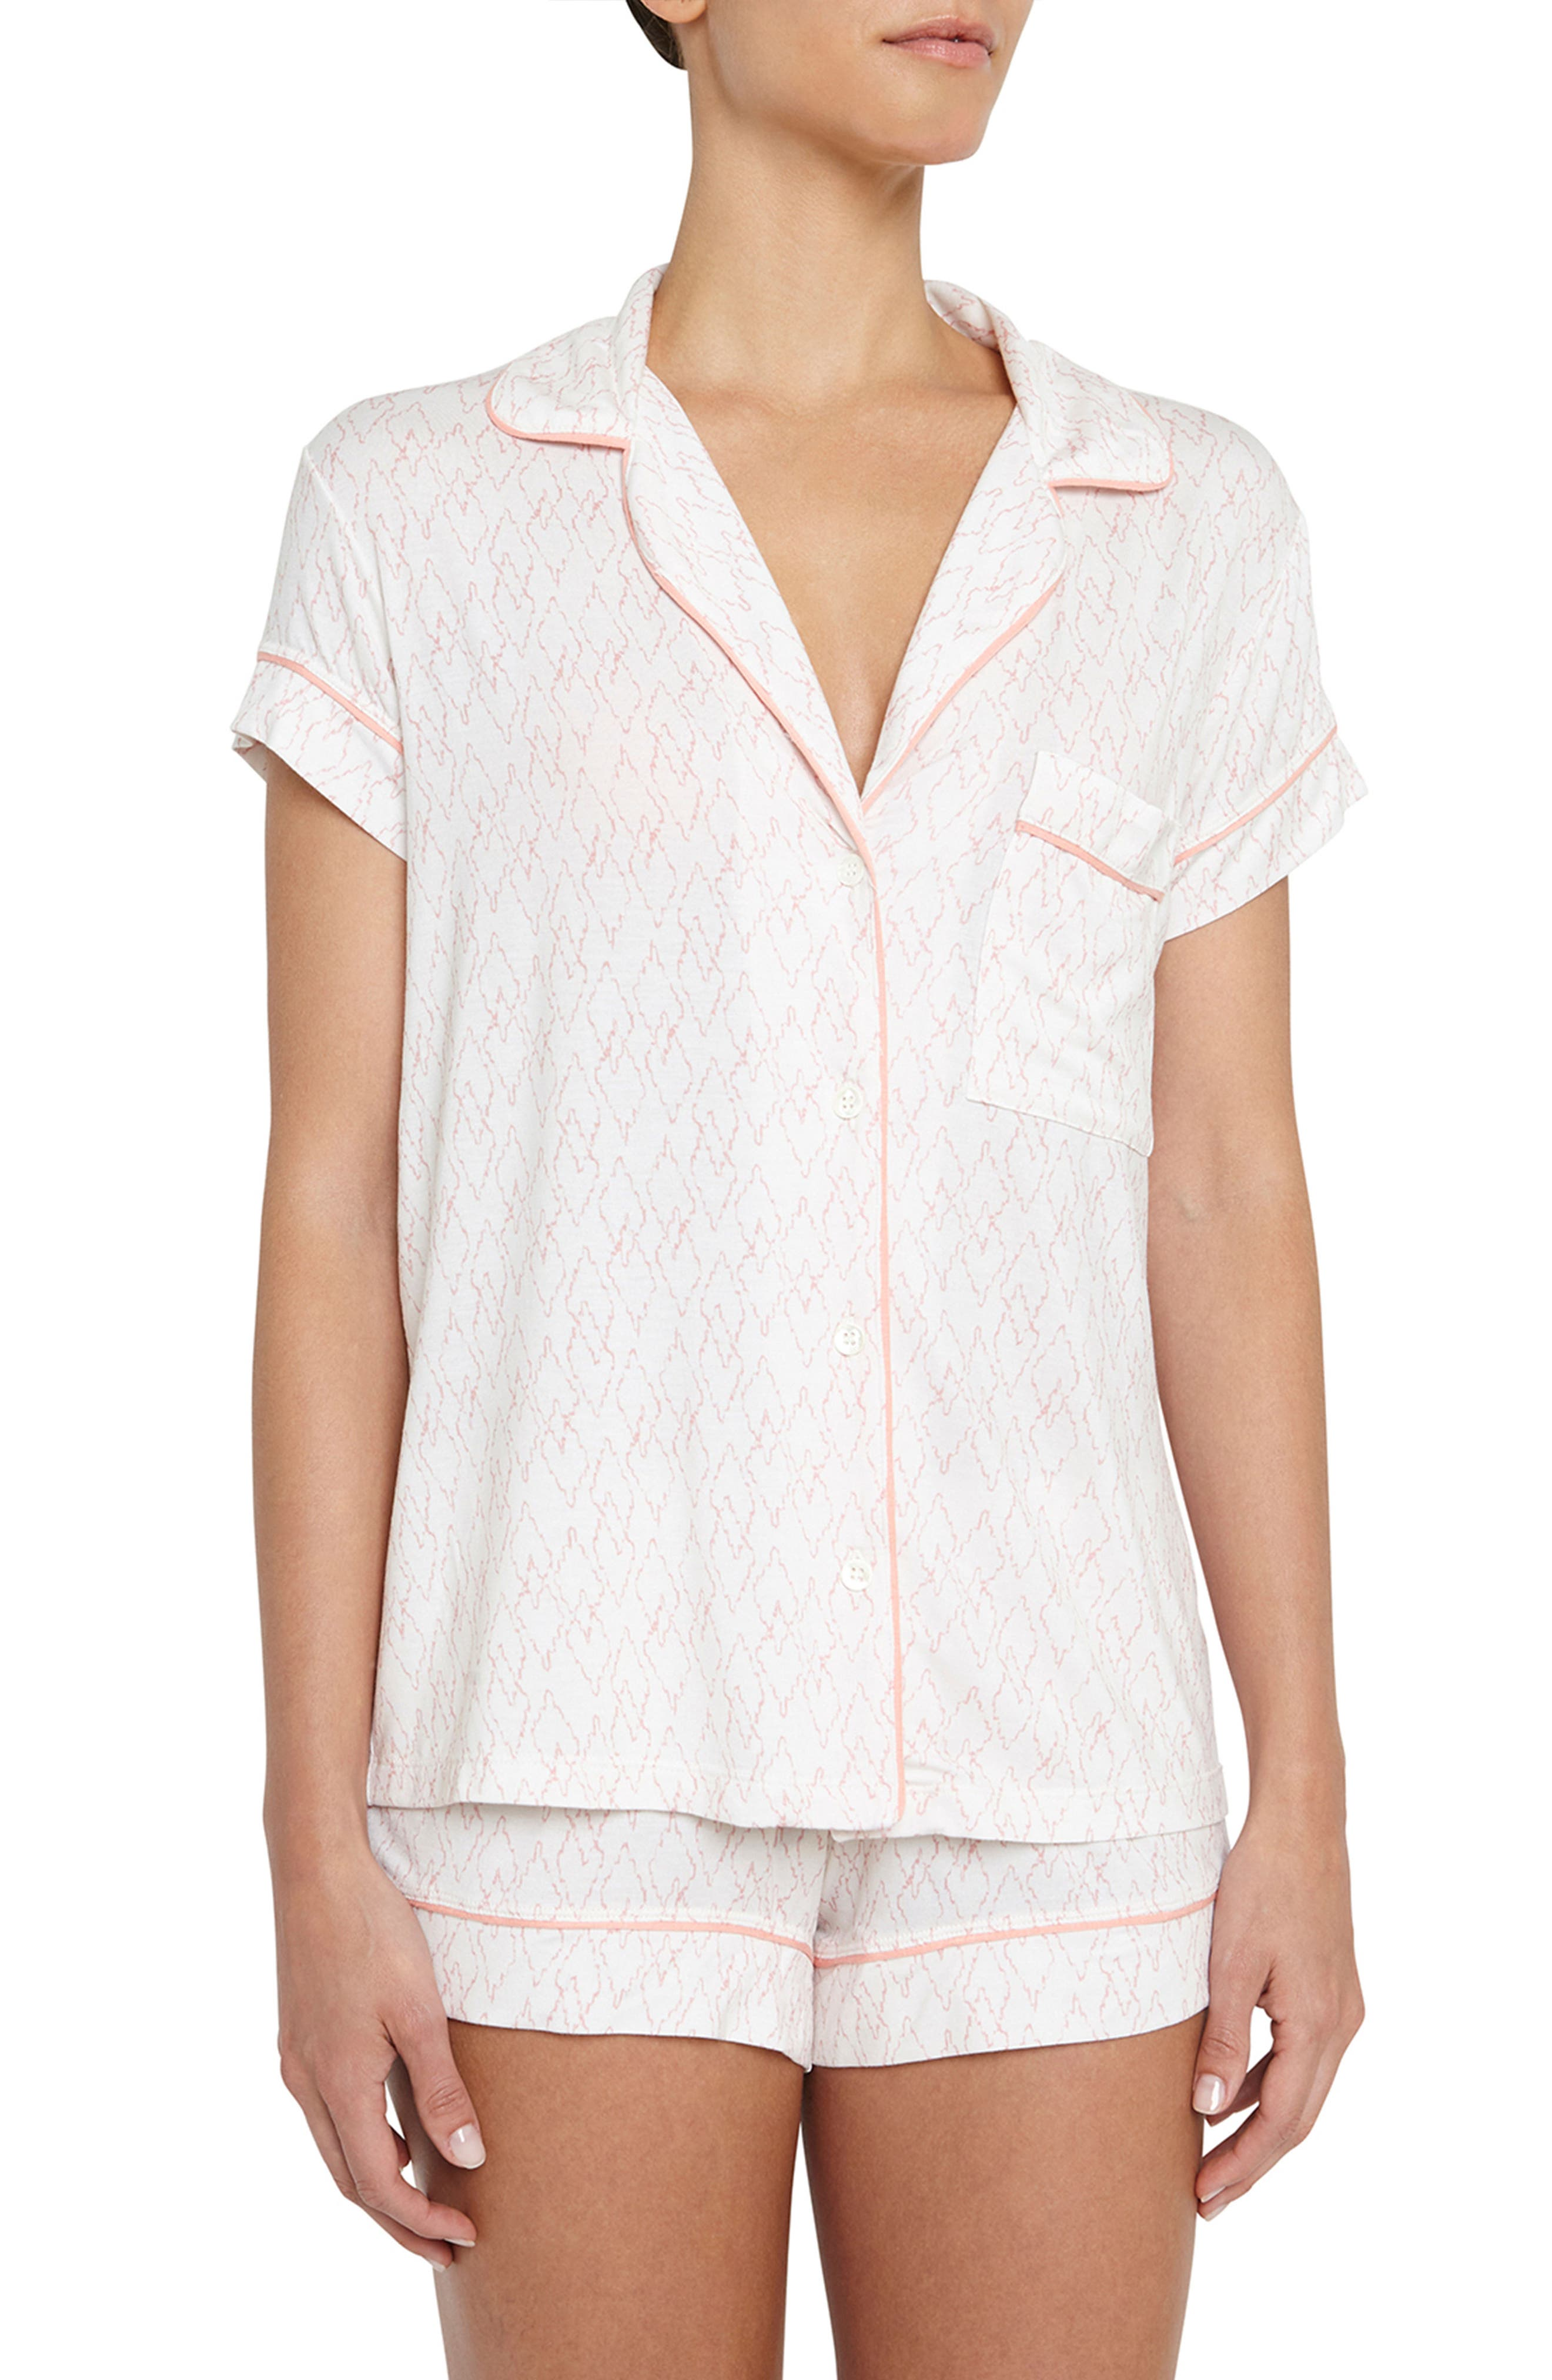 Sweet Heart Short Pajamas,                             Main thumbnail 1, color,                             Ivory/ Candlelight Peach